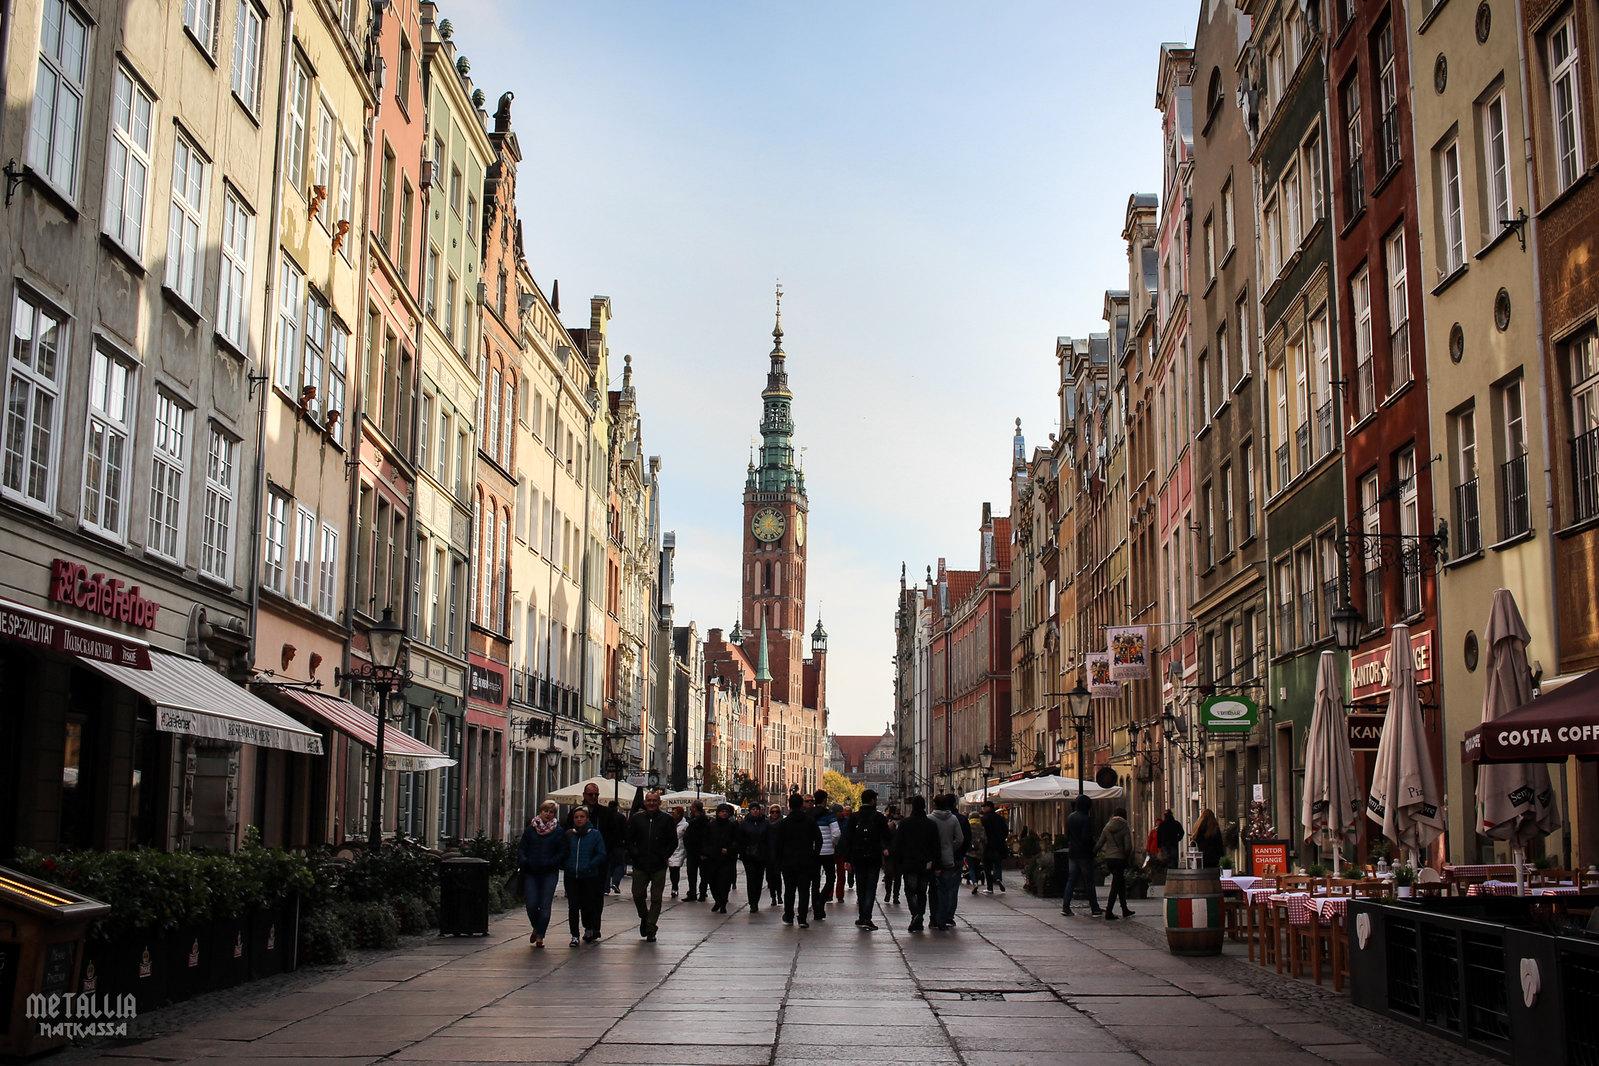 gdansk, gdanskin vanha kaupunki, gdansk old town, gdansk stare miasto